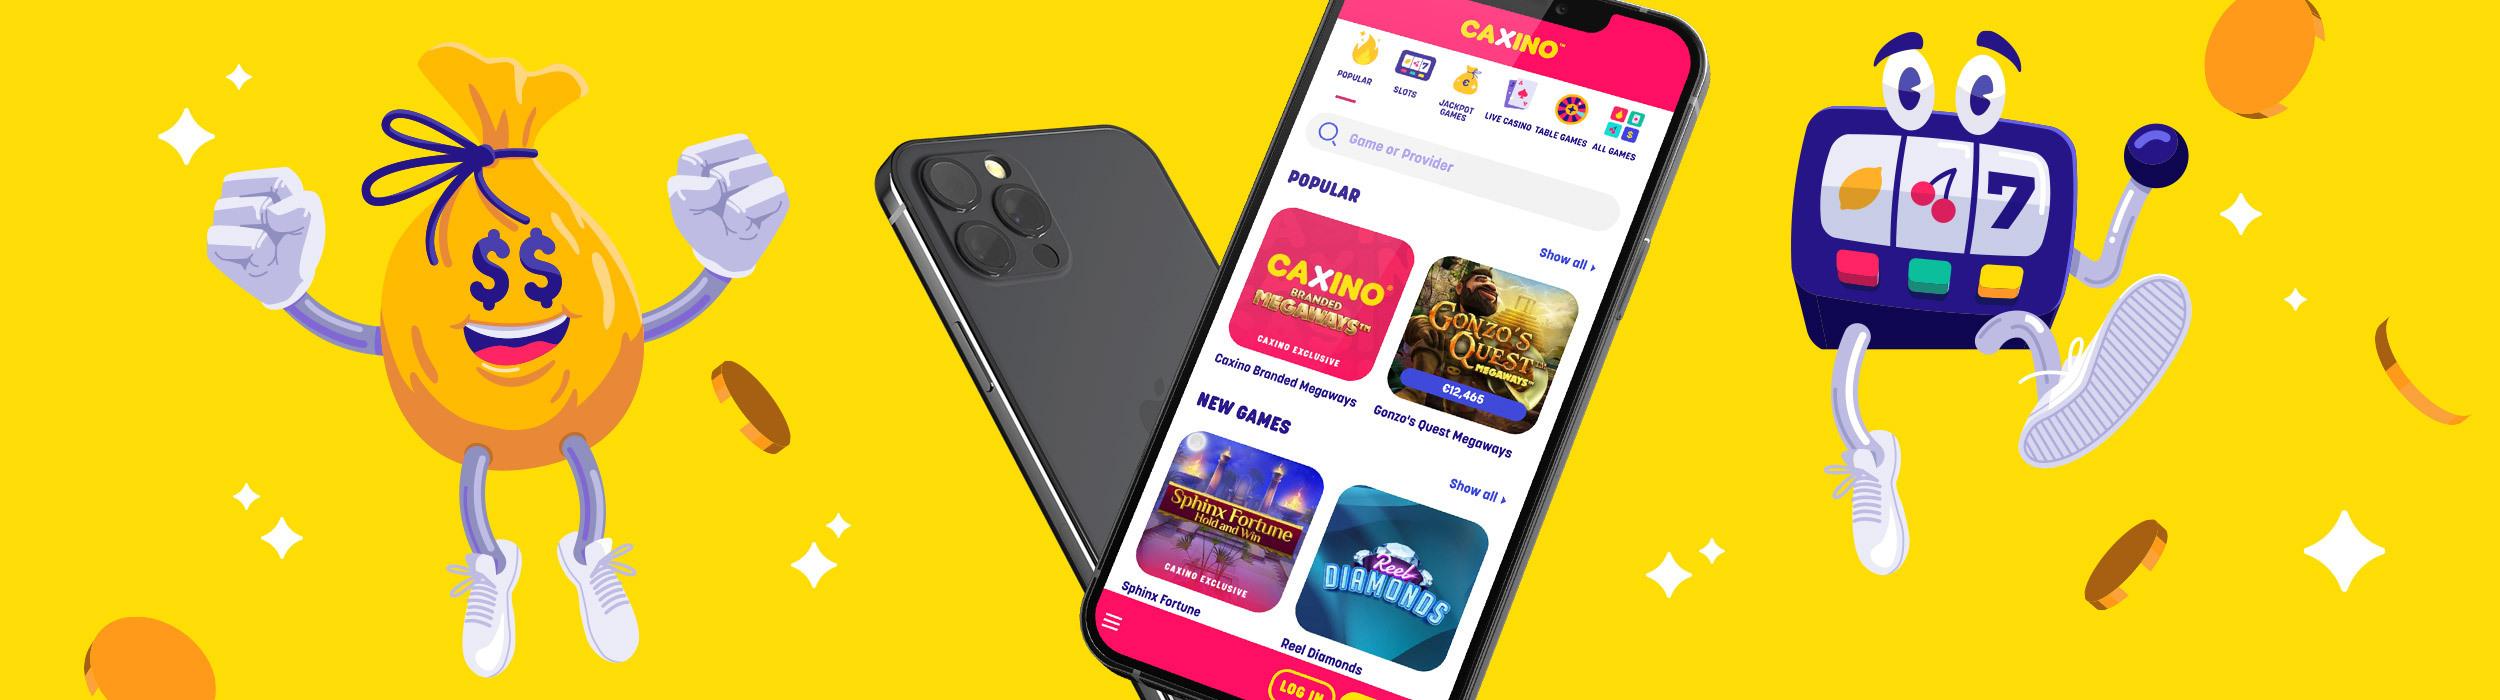 caxino-casino-mobile